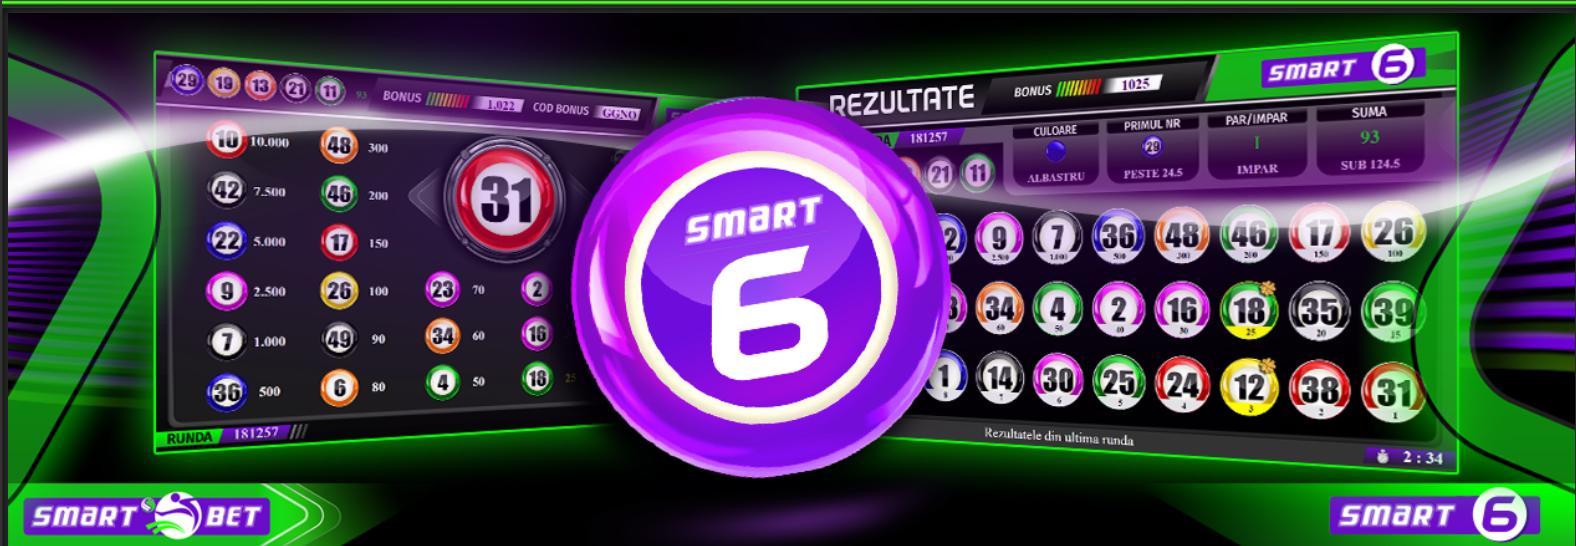 smart 6 la smart bet